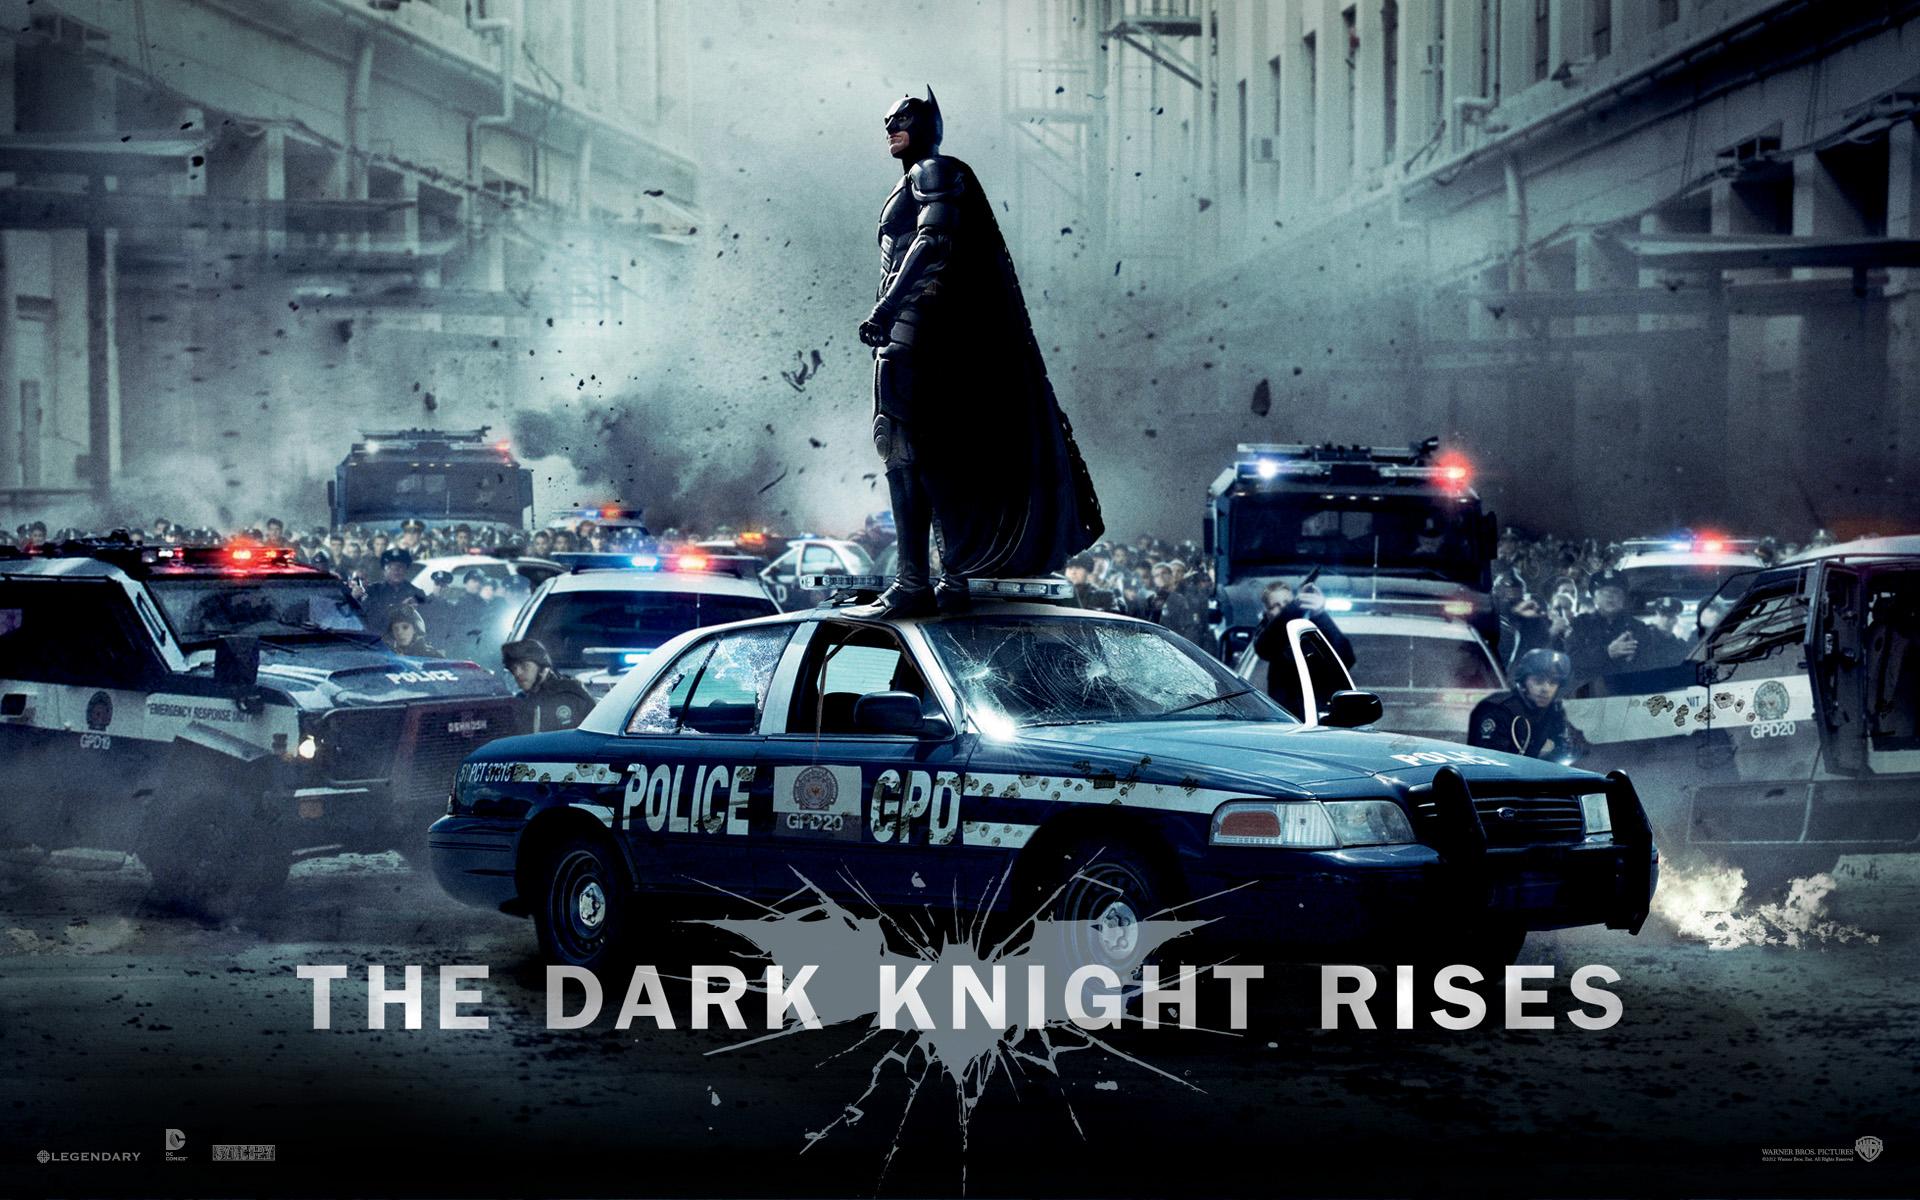 The Dark Knight Rises Wallpaper 1920x1080 Wallpapersafari